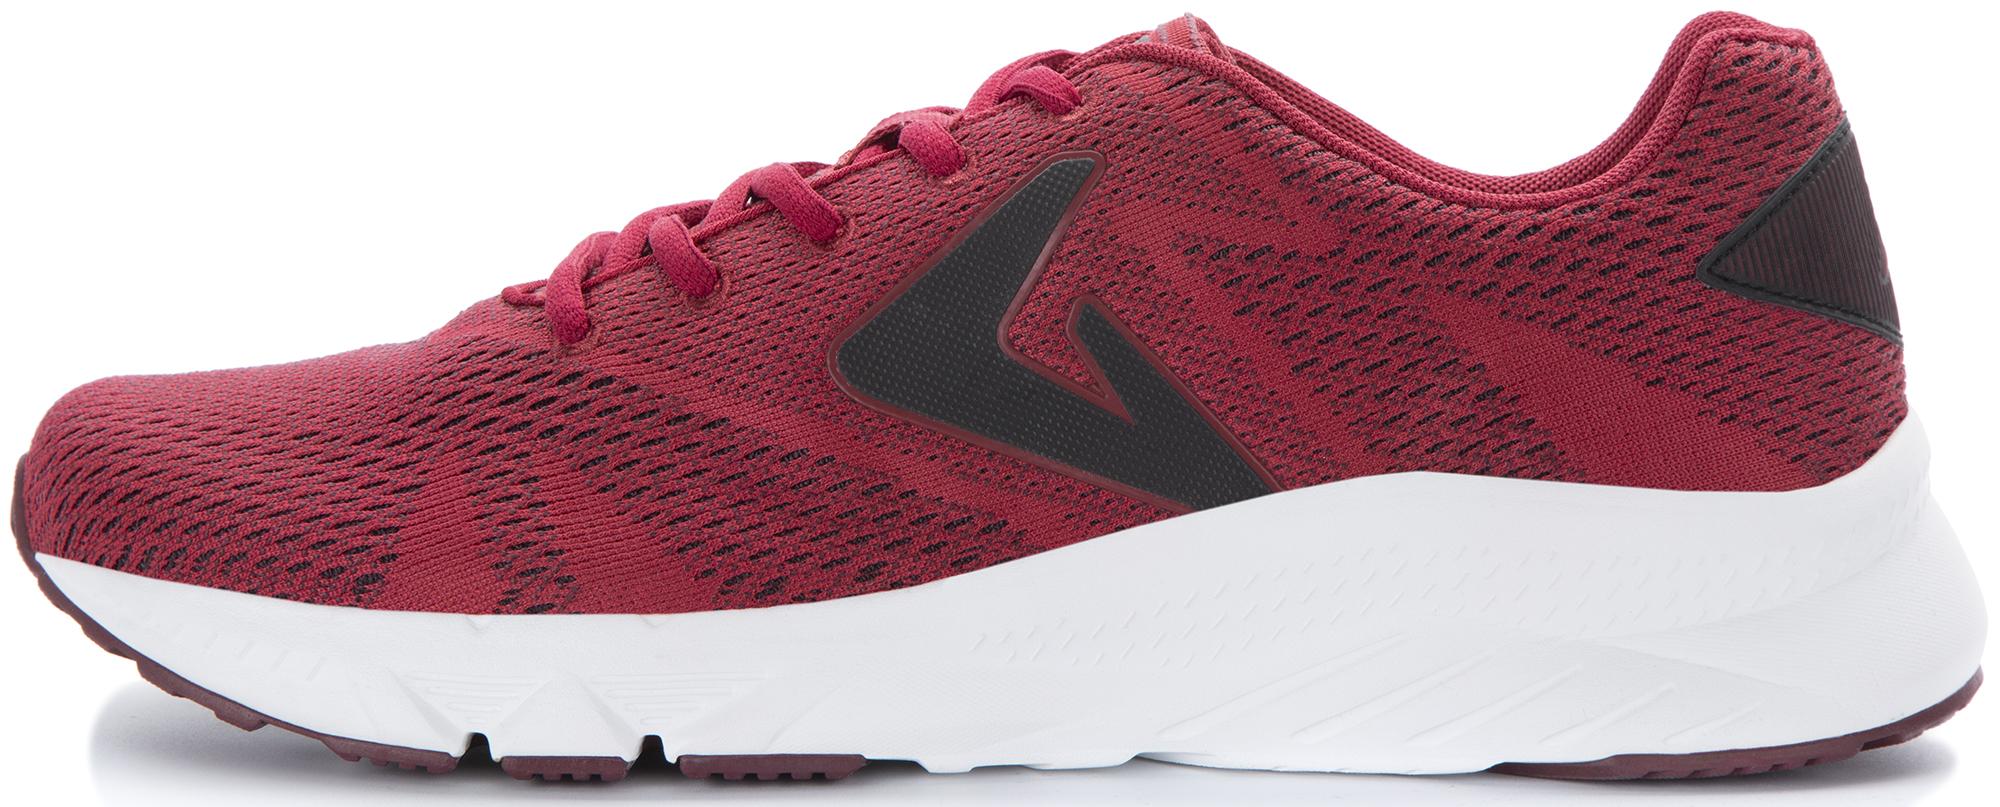 Demix Кроссовки мужские Demix X-Trainer II, размер 45 demix кроссовки для девочек demix x trainer размер 39